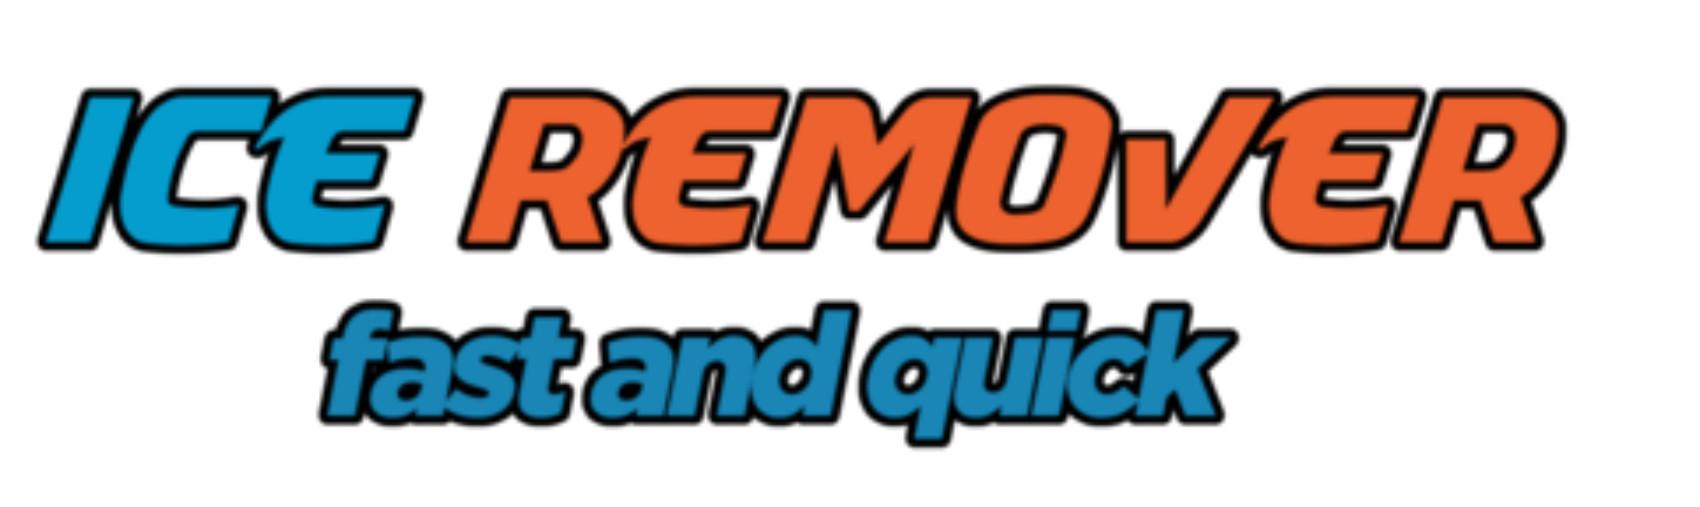 Ice Remover Logo